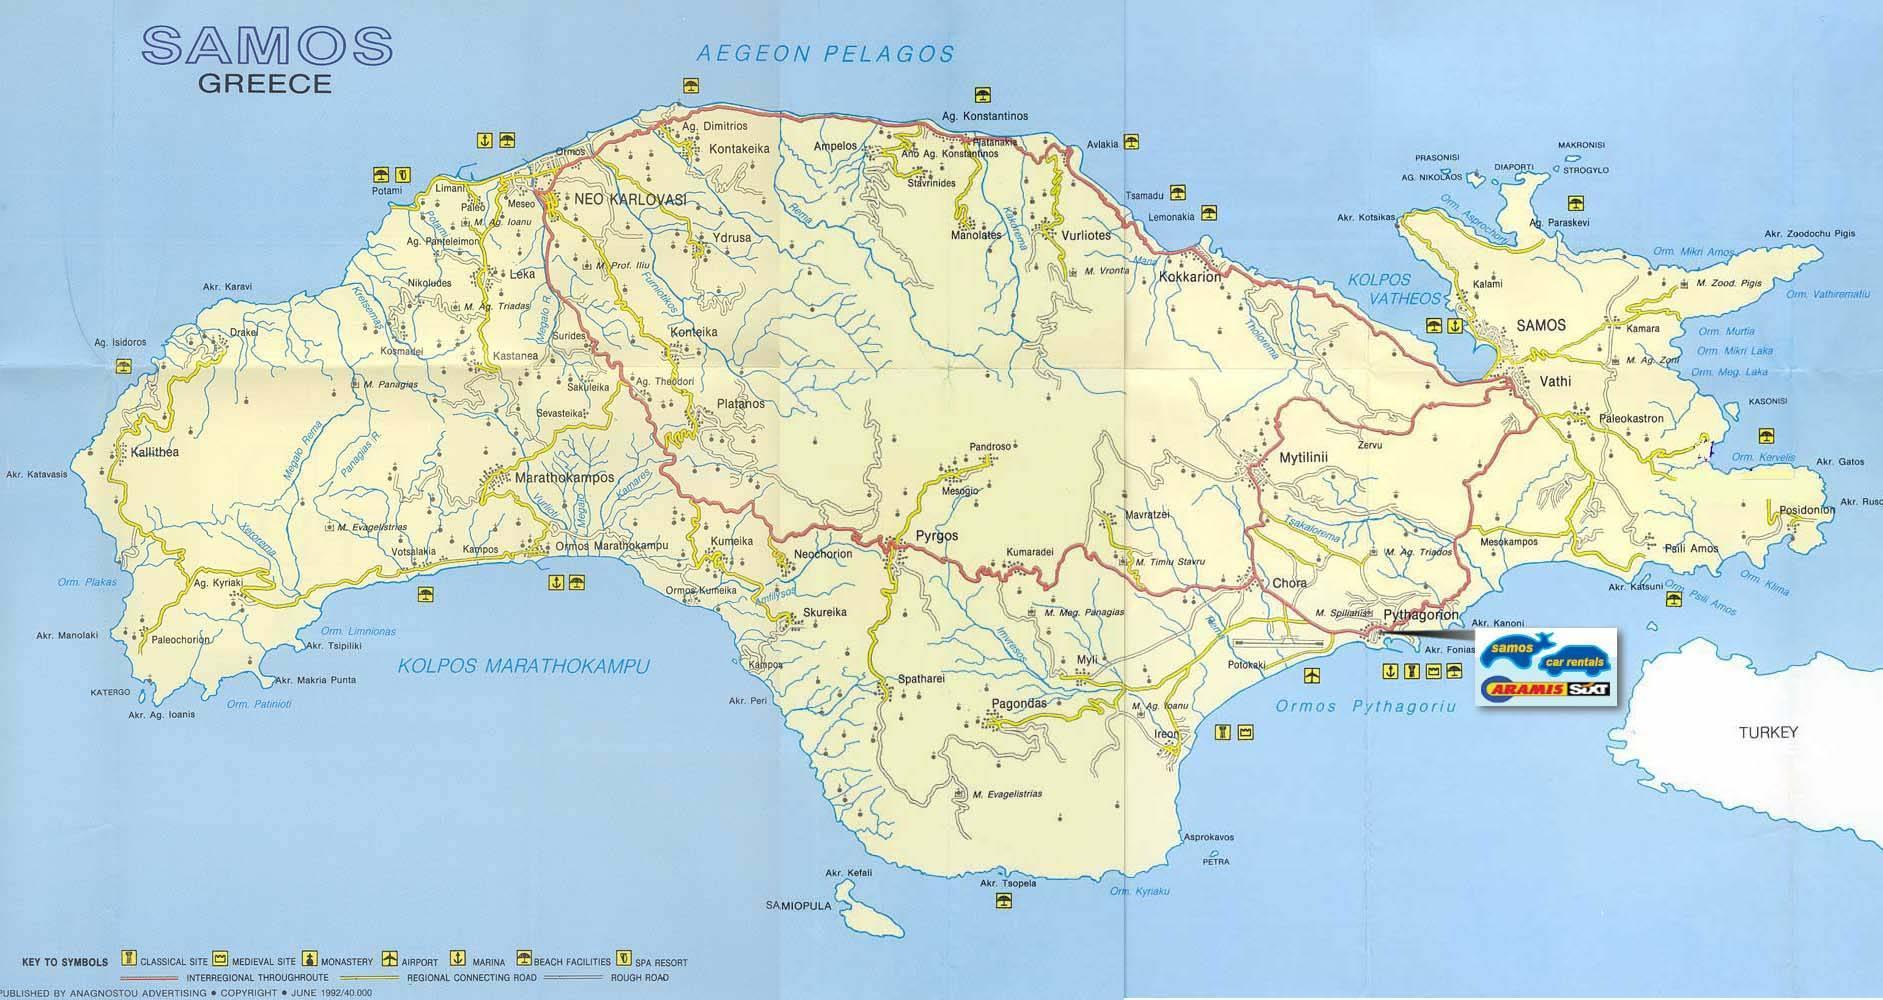 samos mapa Samos Řecko mapa   Mapa Samos Řecko (Jižní Evropa   Evropa) samos mapa